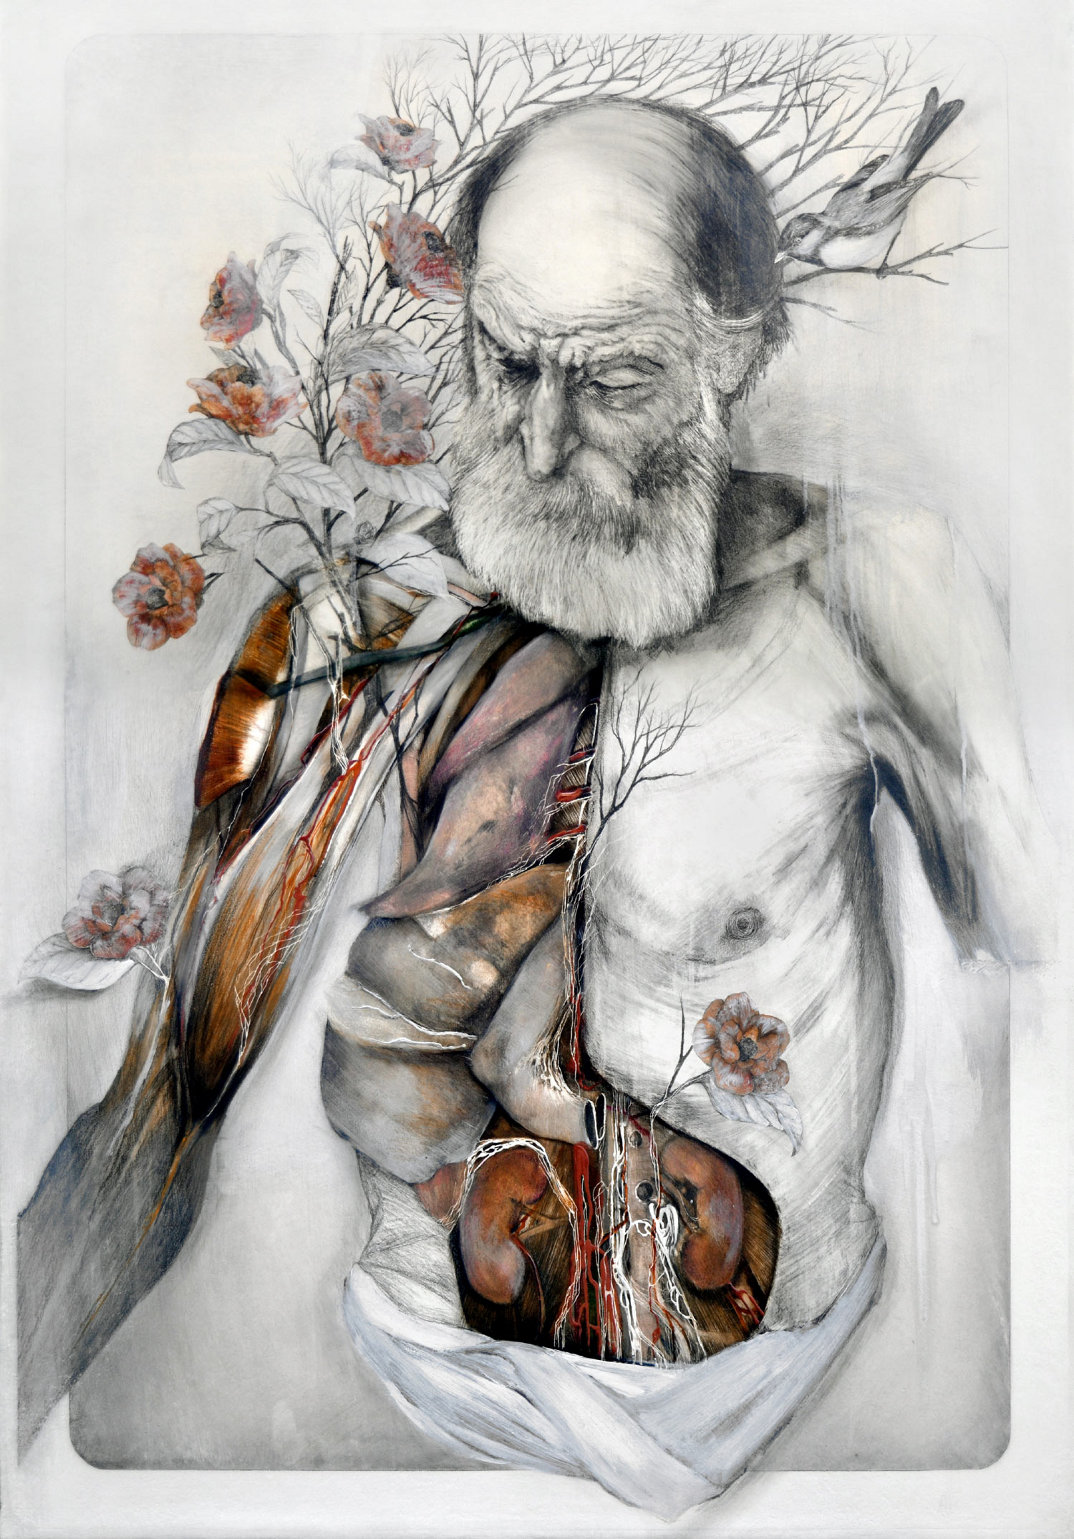 dipinti-corpi-anatomia-nunzio-paci-6